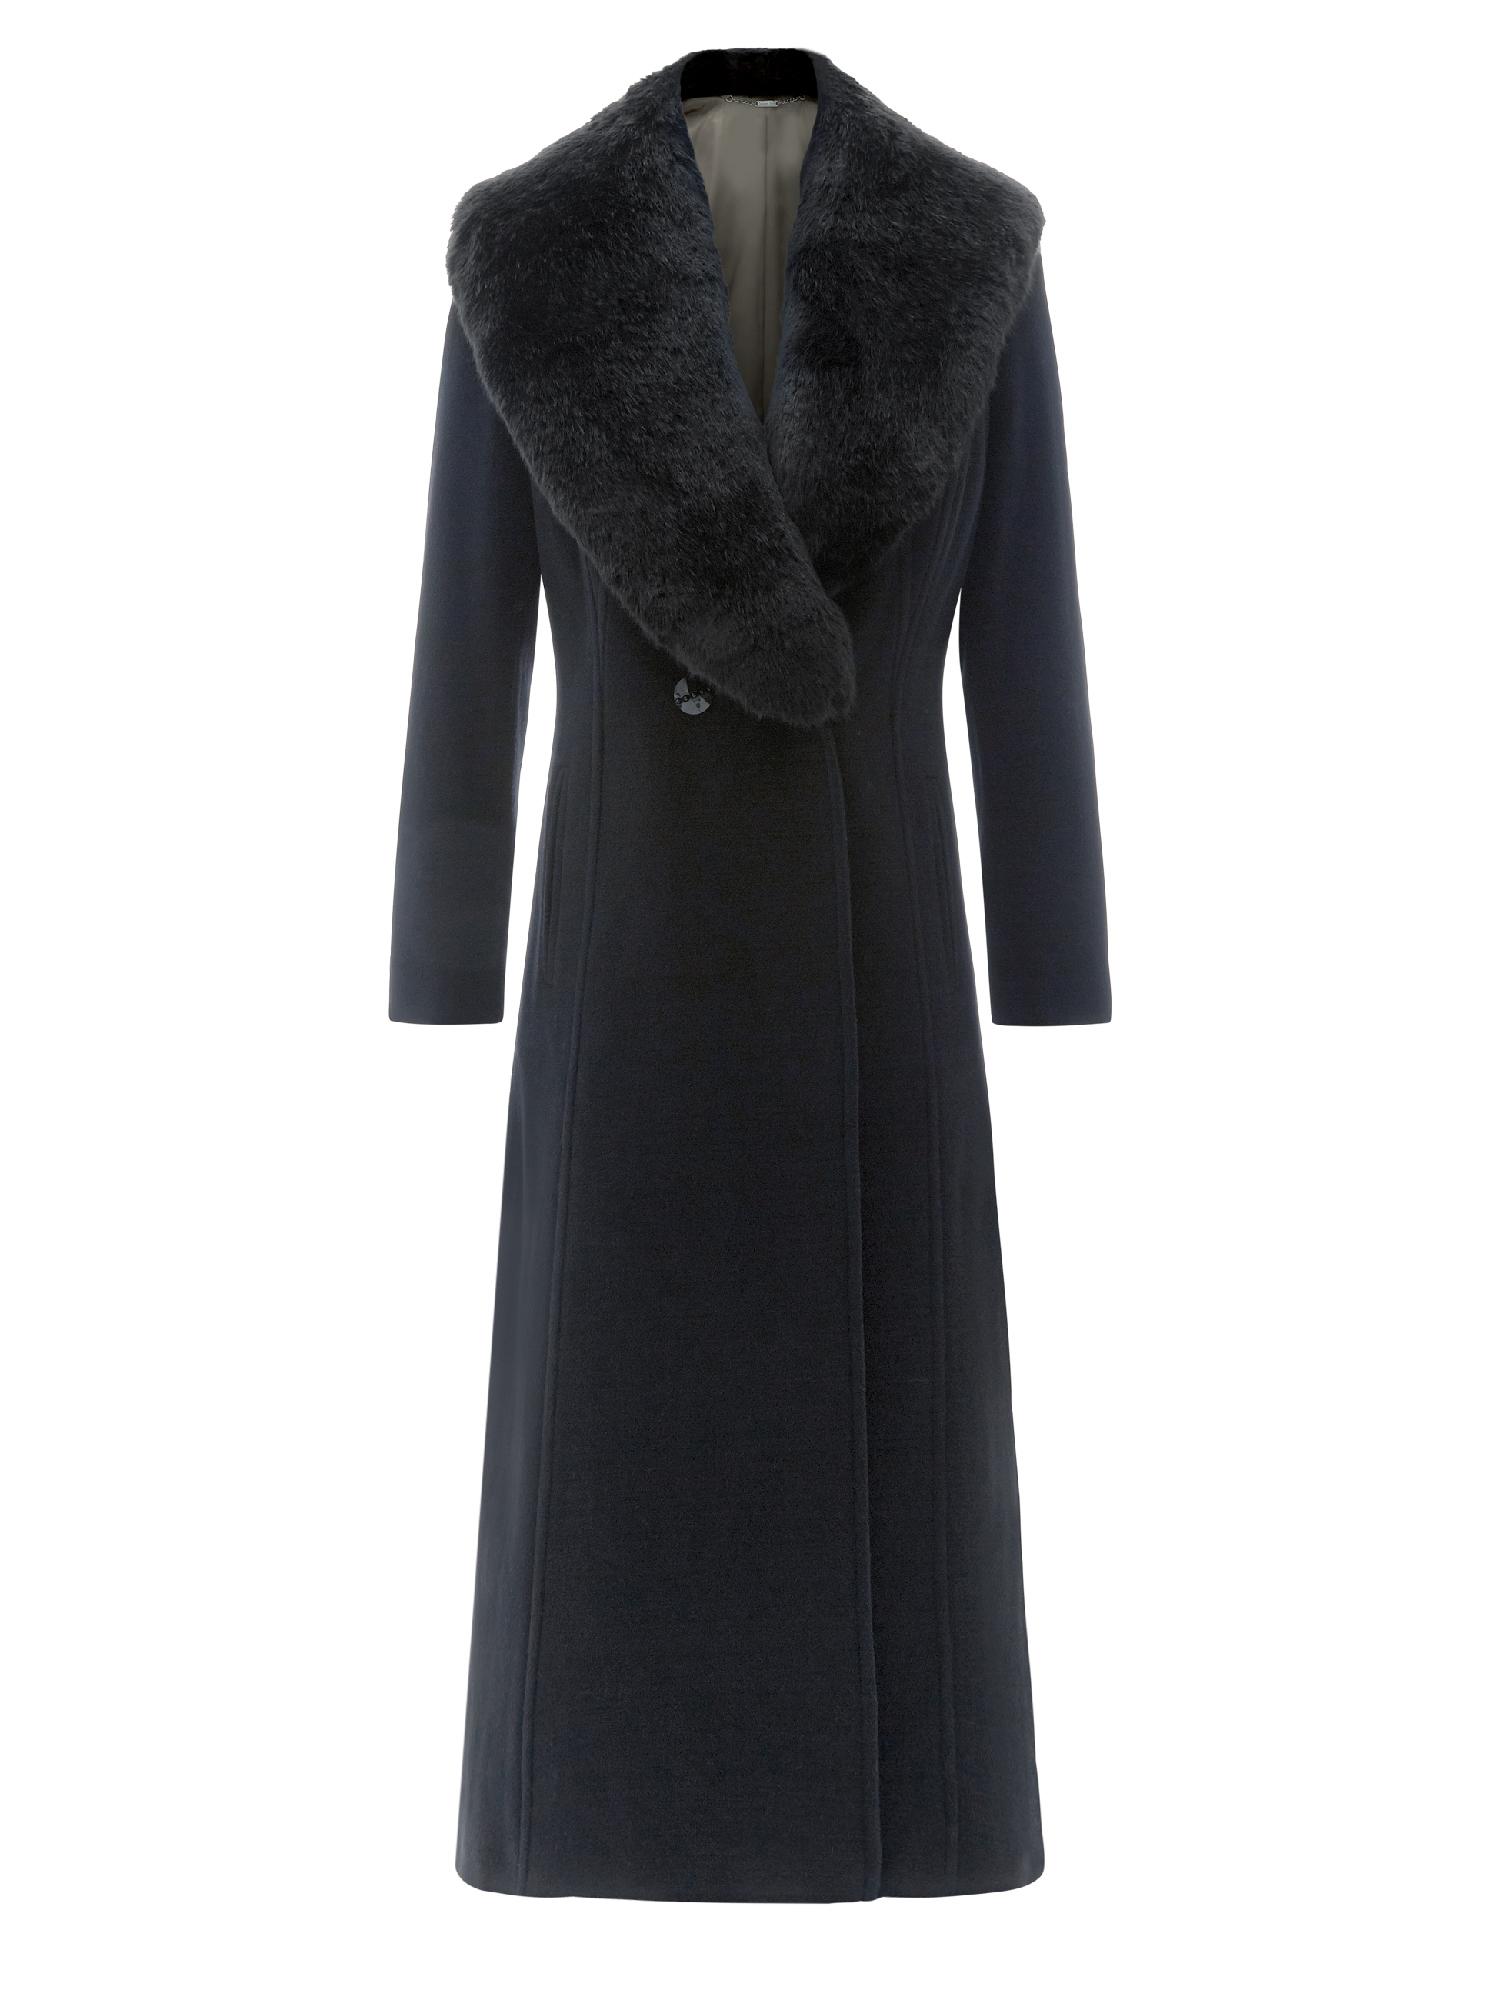 Black Long Coat With Fur Collar